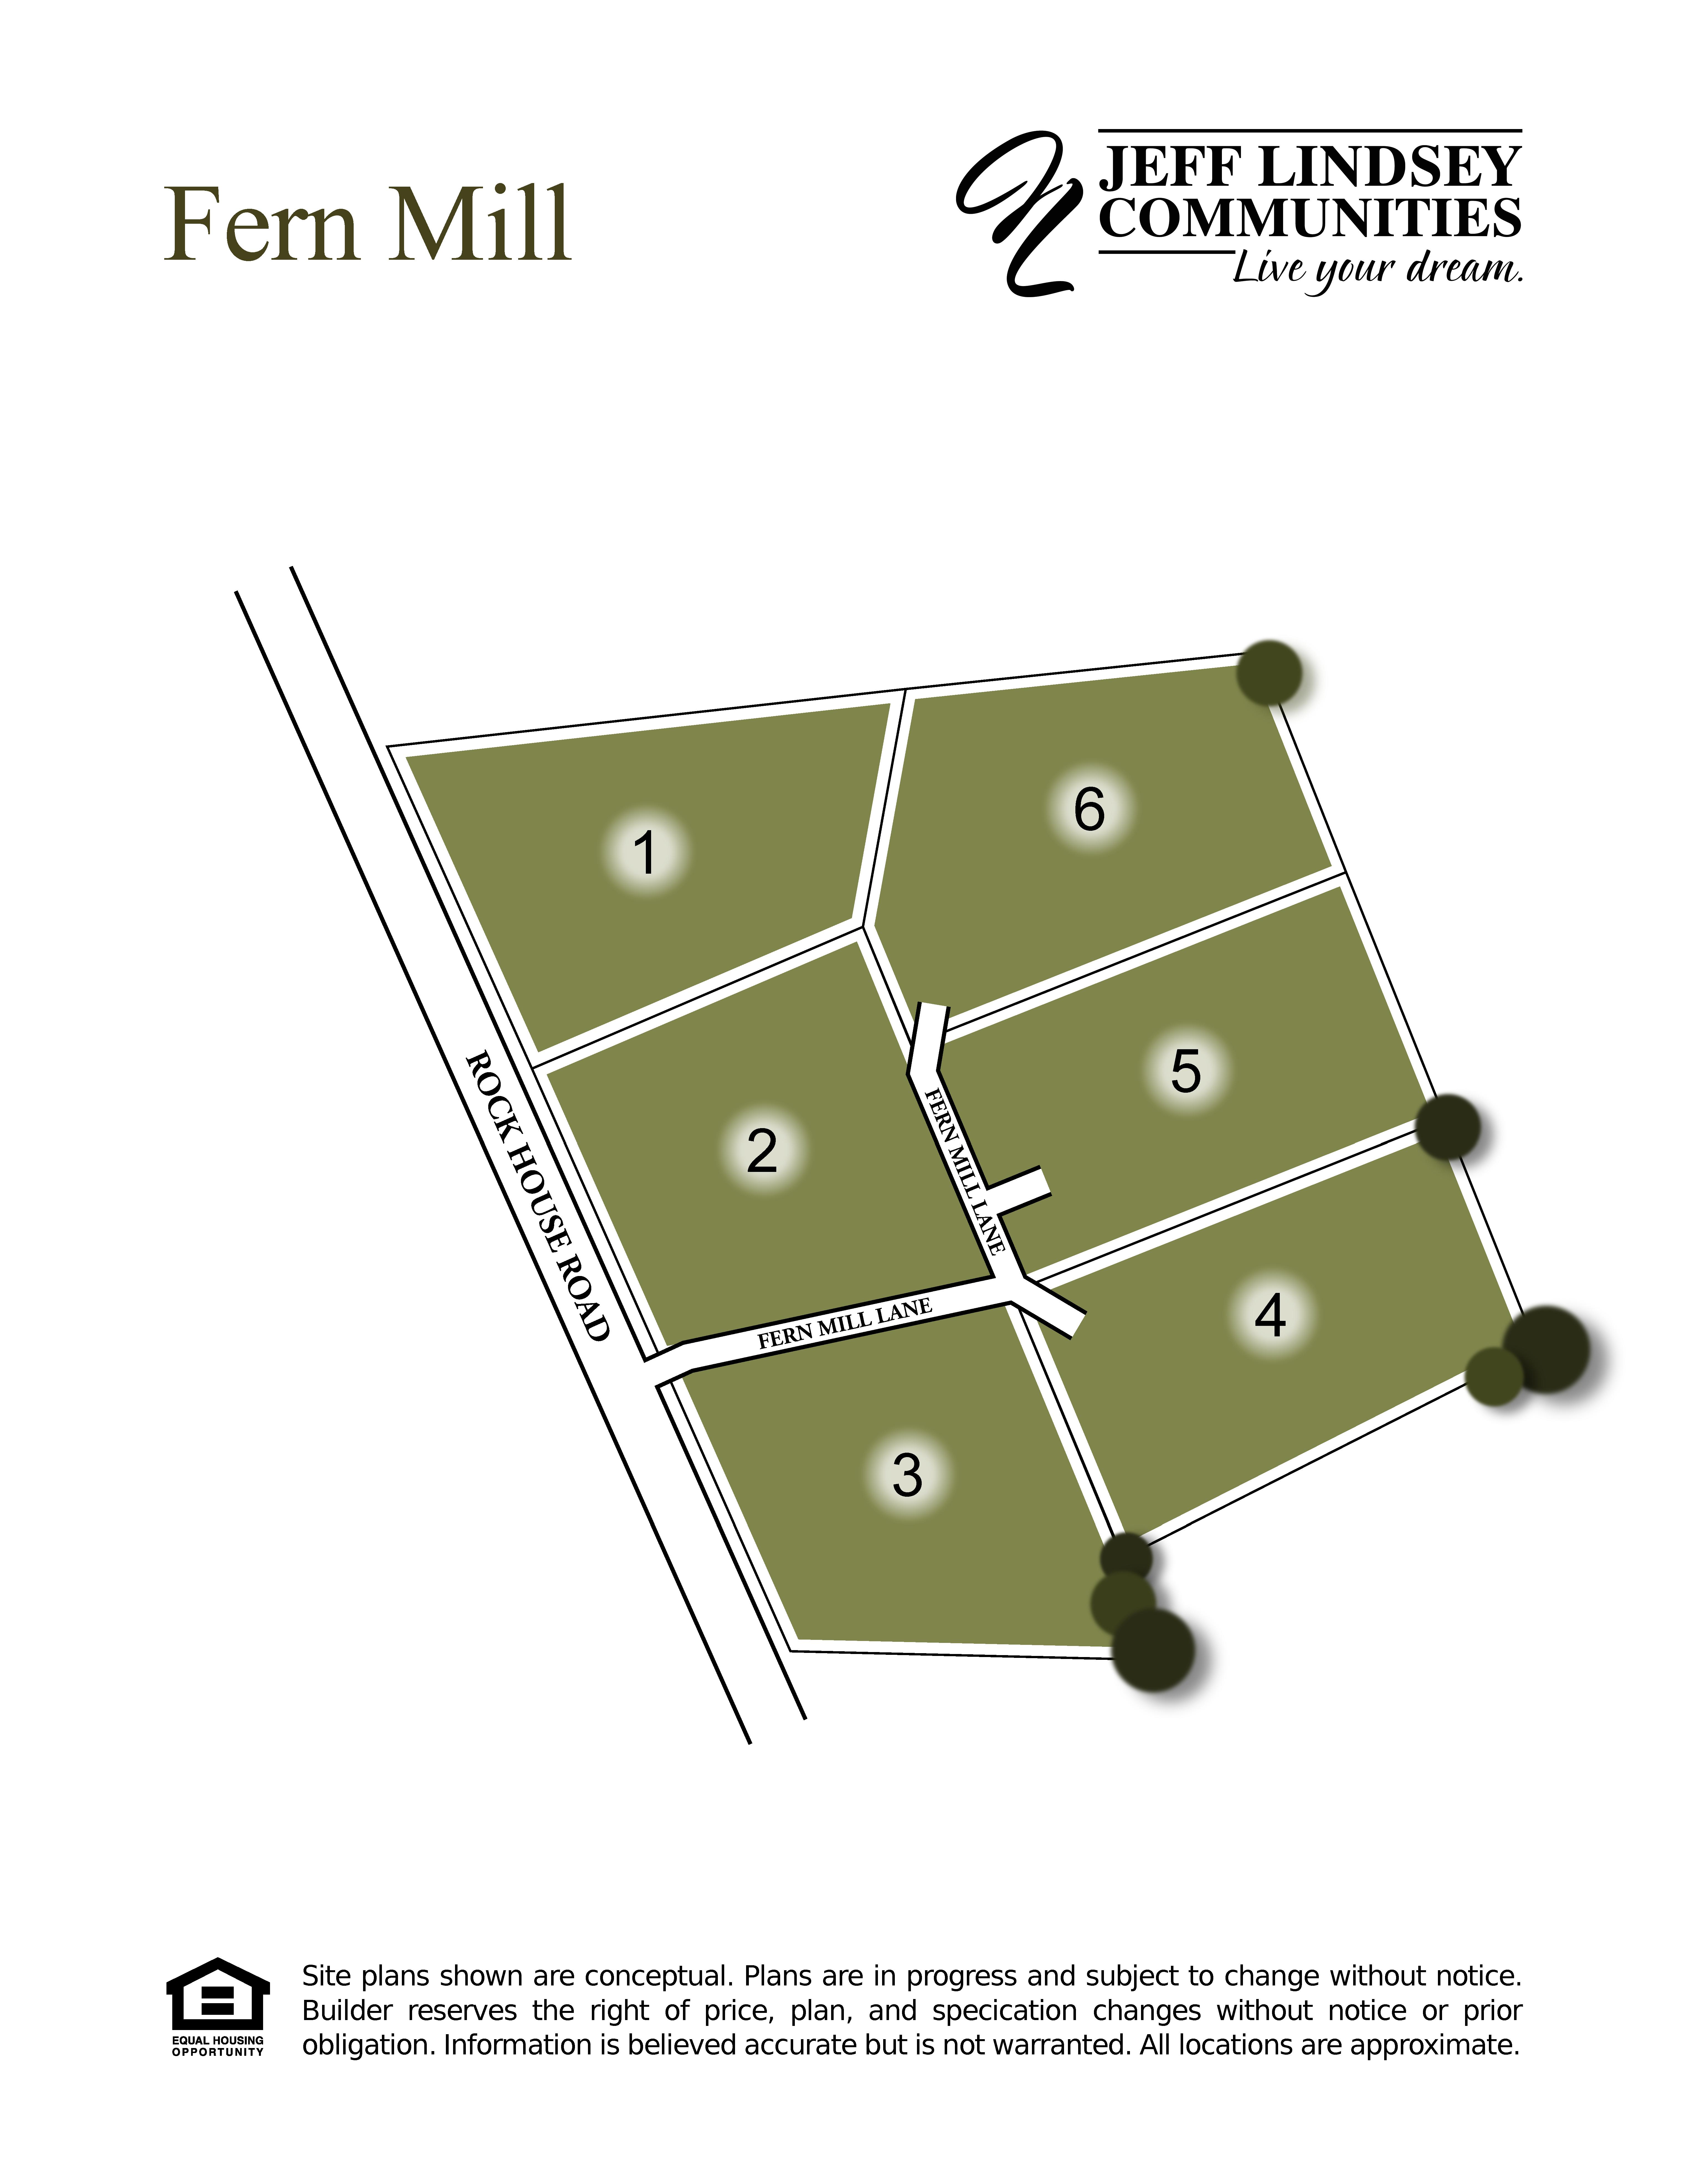 Fern Mill Site Map